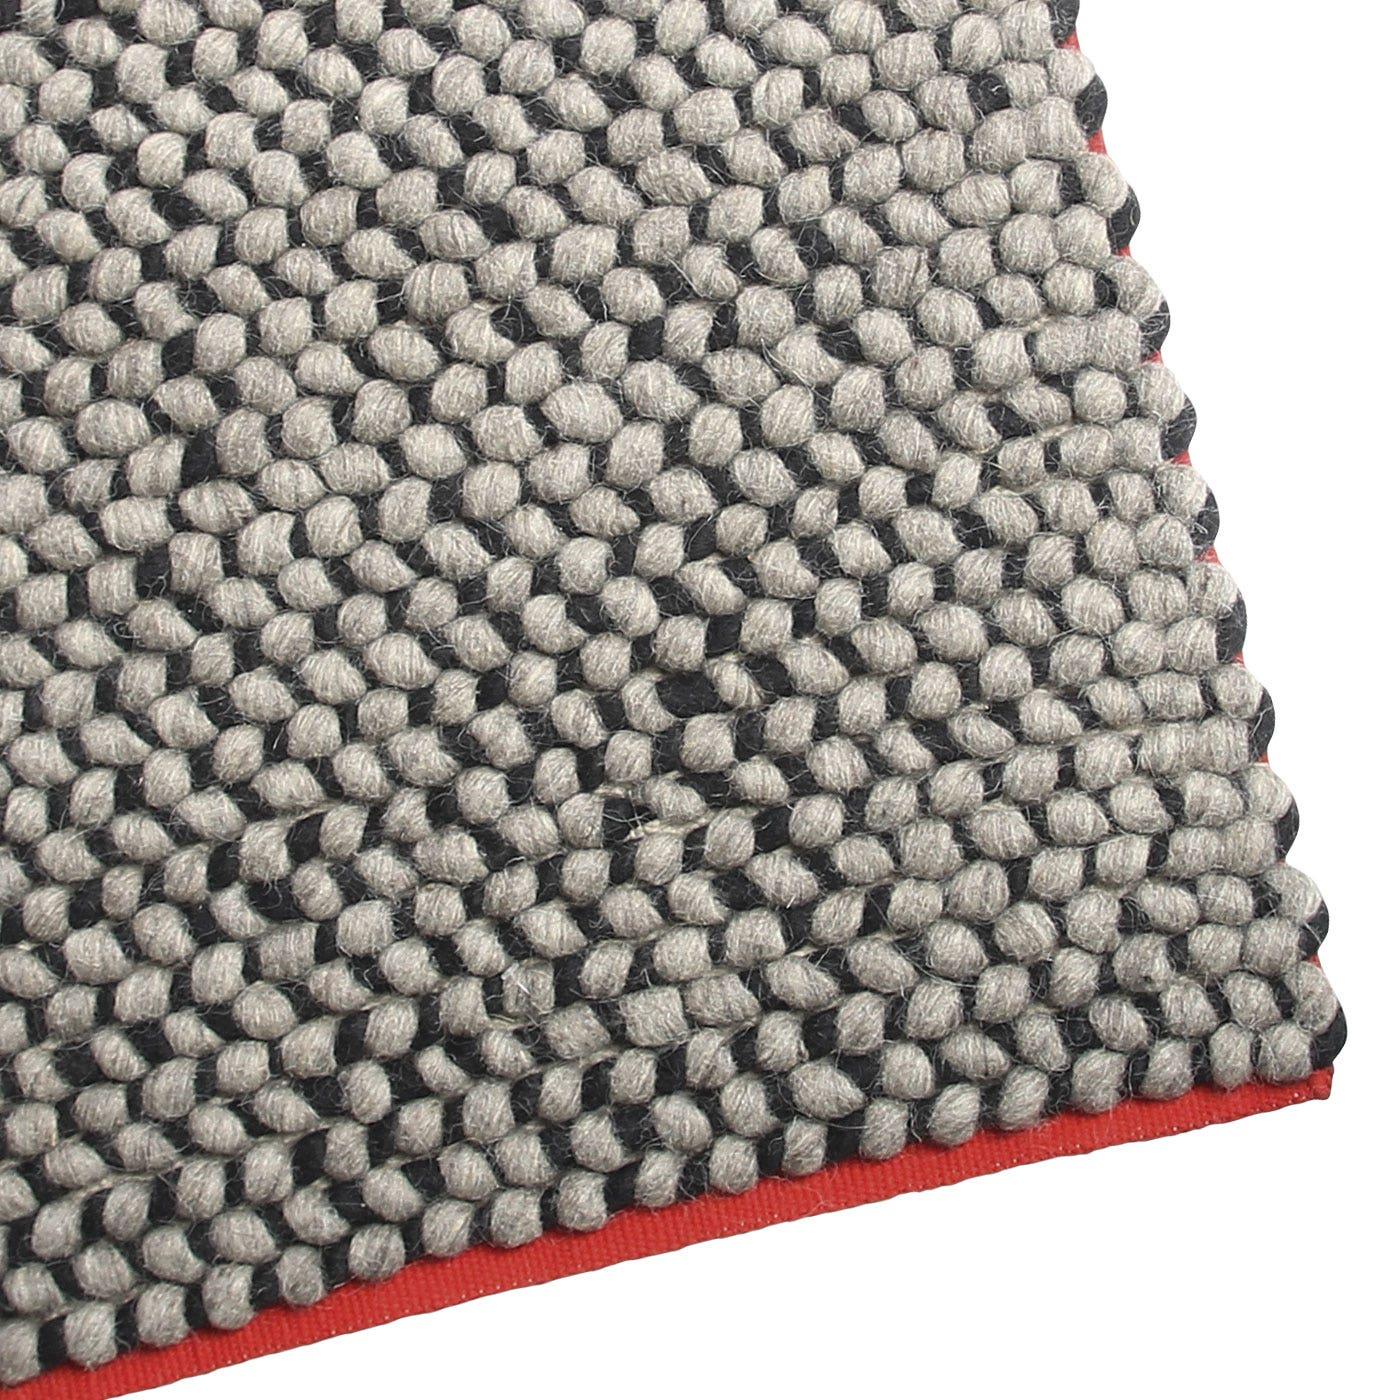 dollop ' x ' wool rug  modern wool rugs  blu dot - previous image dollop ' x ' modern